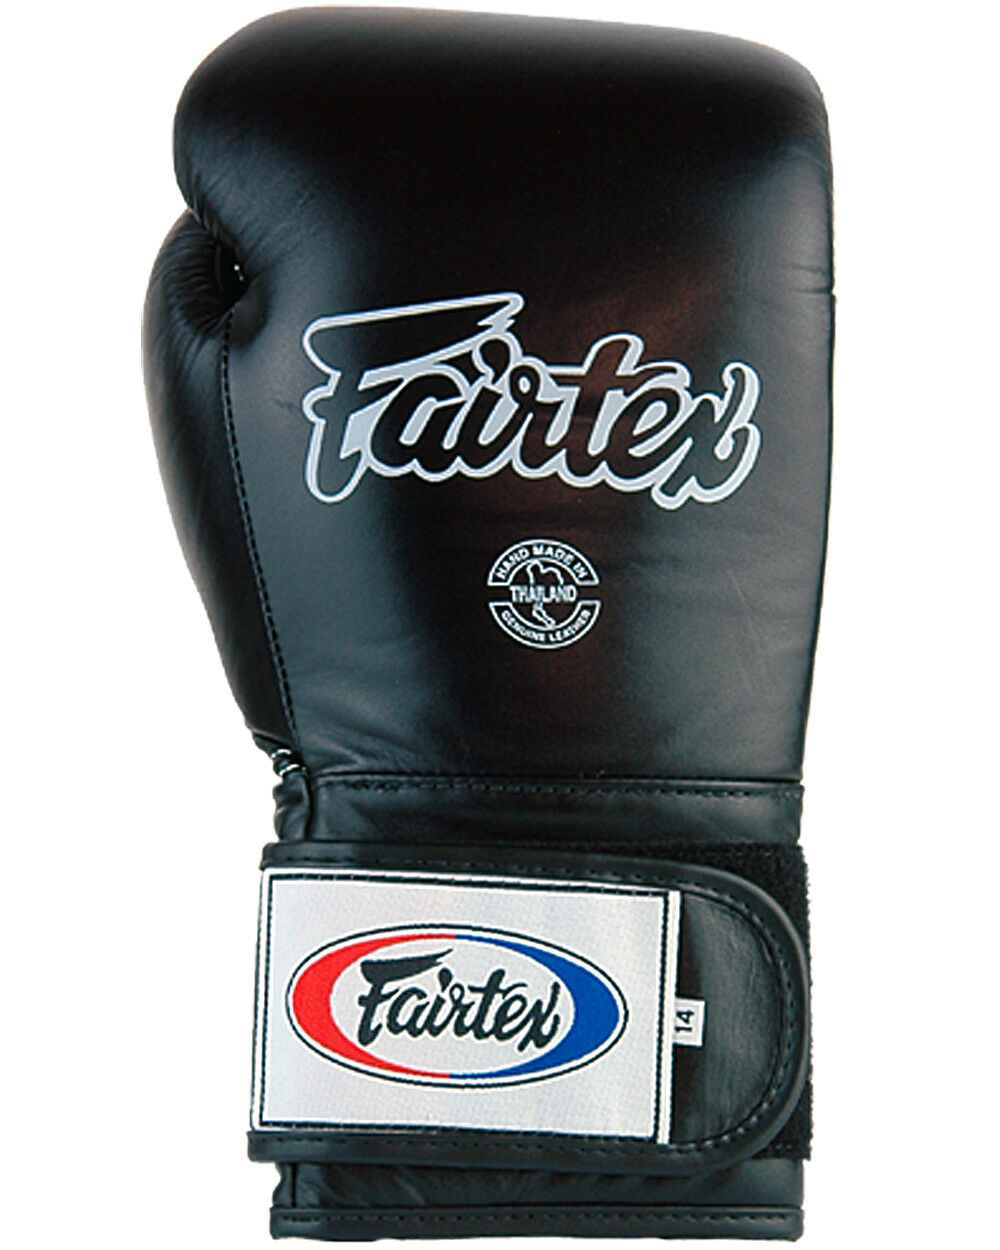 Fairtex Leder Boxhandschuhe Wide Fit (BGV4), (BGV4), Fit für Muay Thai, Boxen und MMA 5f7d52